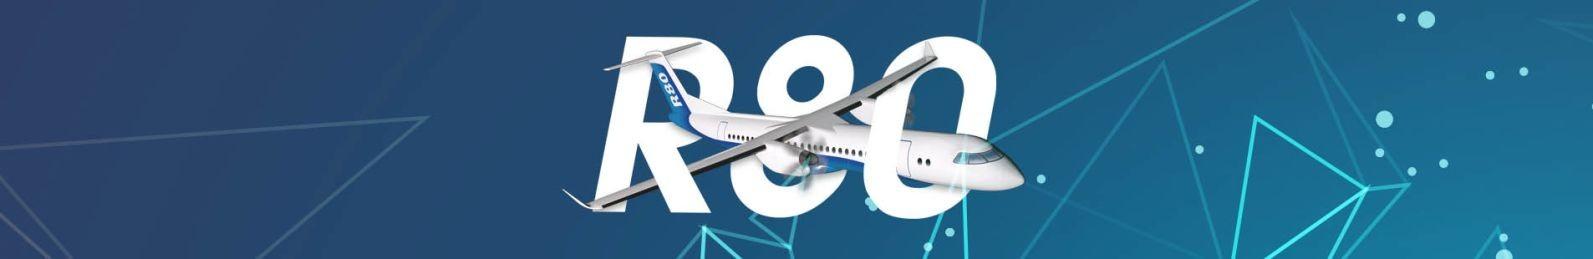 Official Pesawat R80